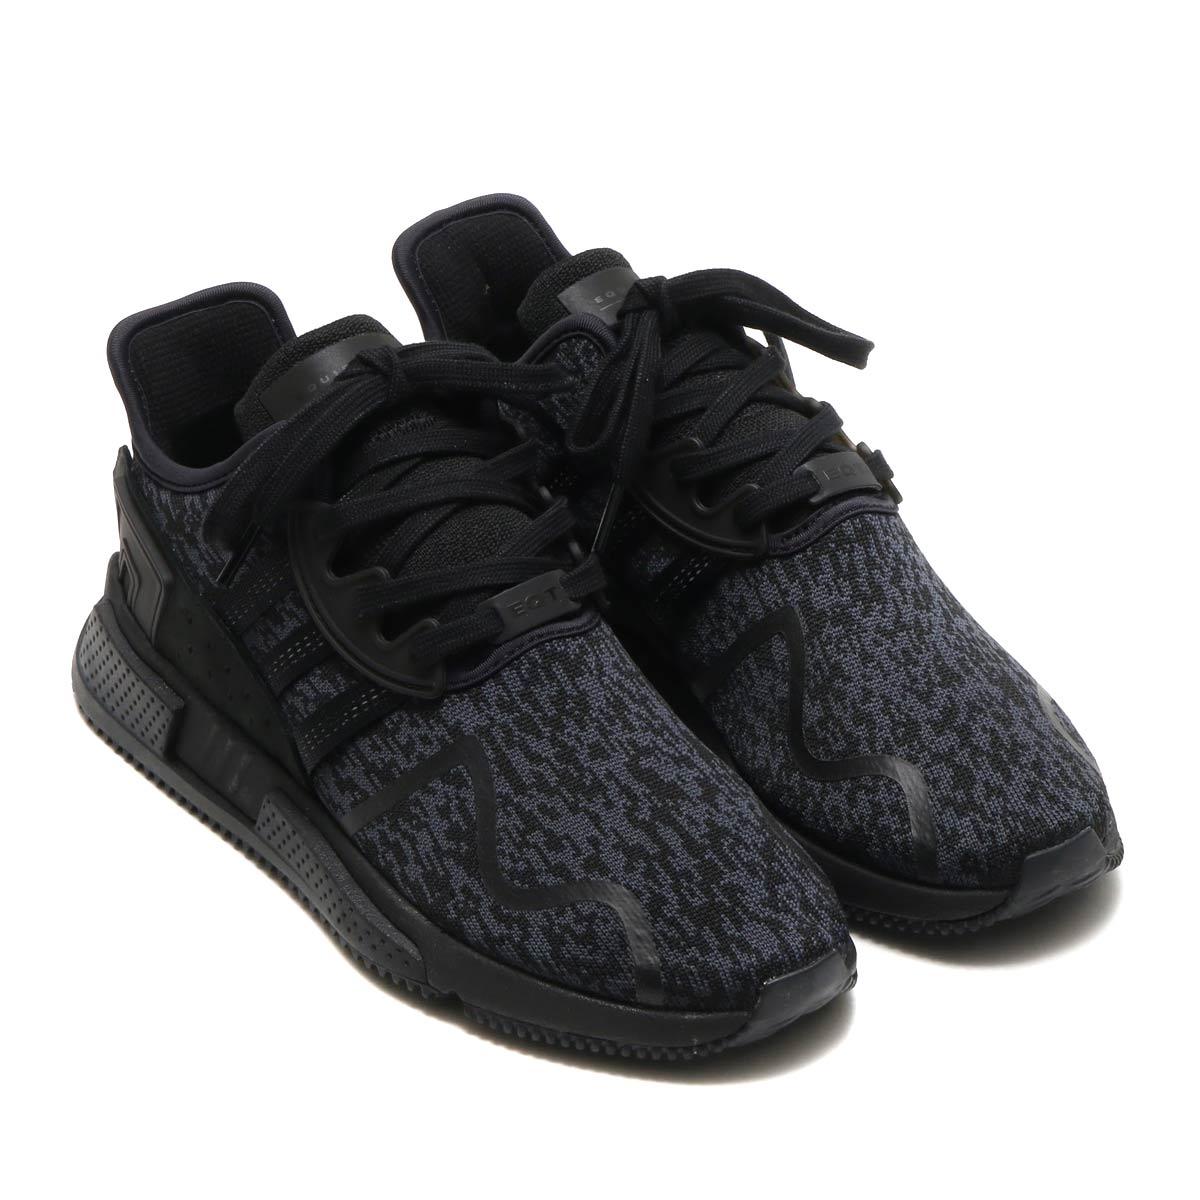 adidas Originals EQT CUSHION ADV (アディダス オリジナルス EQT クッション ADV)Core Black/Core Black/Running White【メンズ スニーカー】17FW-I